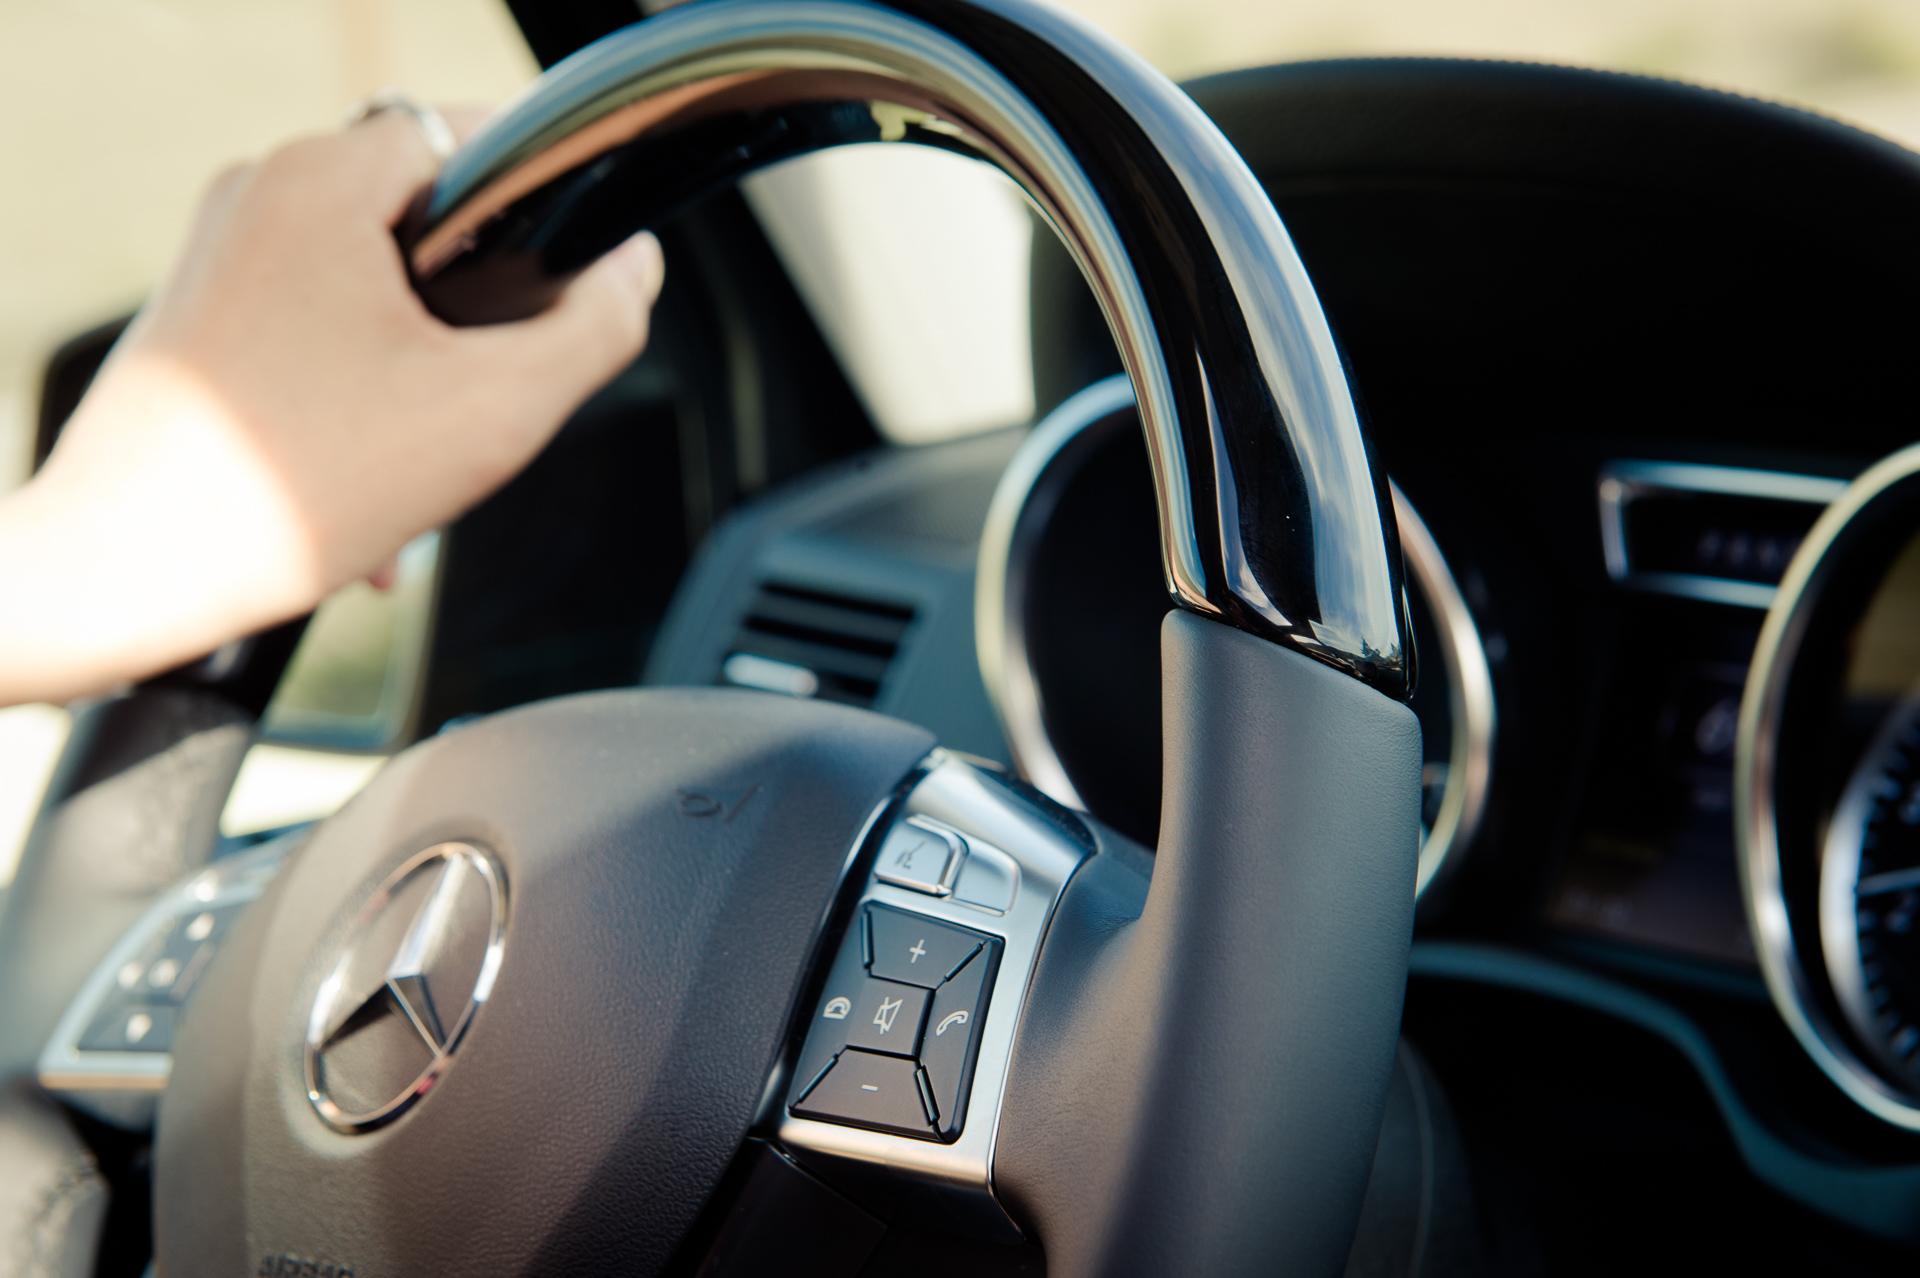 2014-Mercedes-Benz-G500-G550-braun-Kalifornien-mbrt14-13